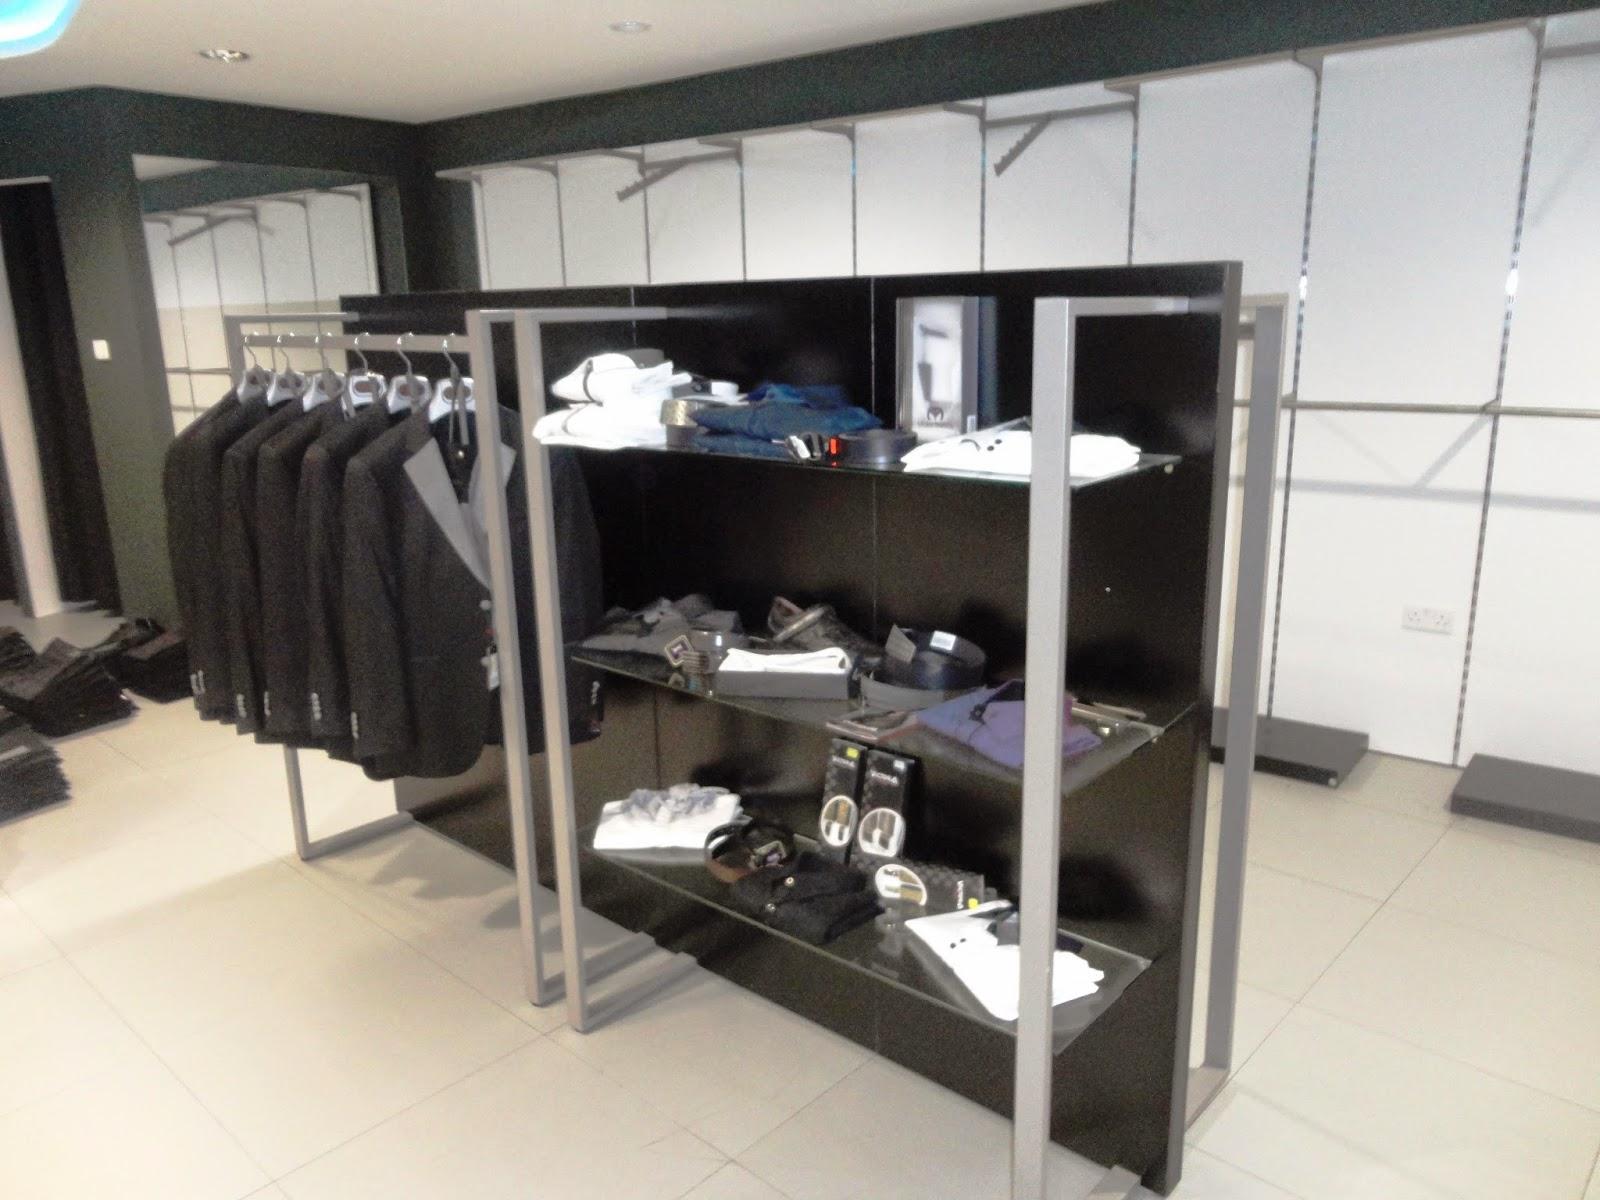 148262a8624 Τα τραπέζια χρησιμοποιούνται στο κέντρο του καταστήματος για προβολή  διπλωμένων ρούχων ή για τη δημιουργία θεματικών ενότητων με προσφορές.